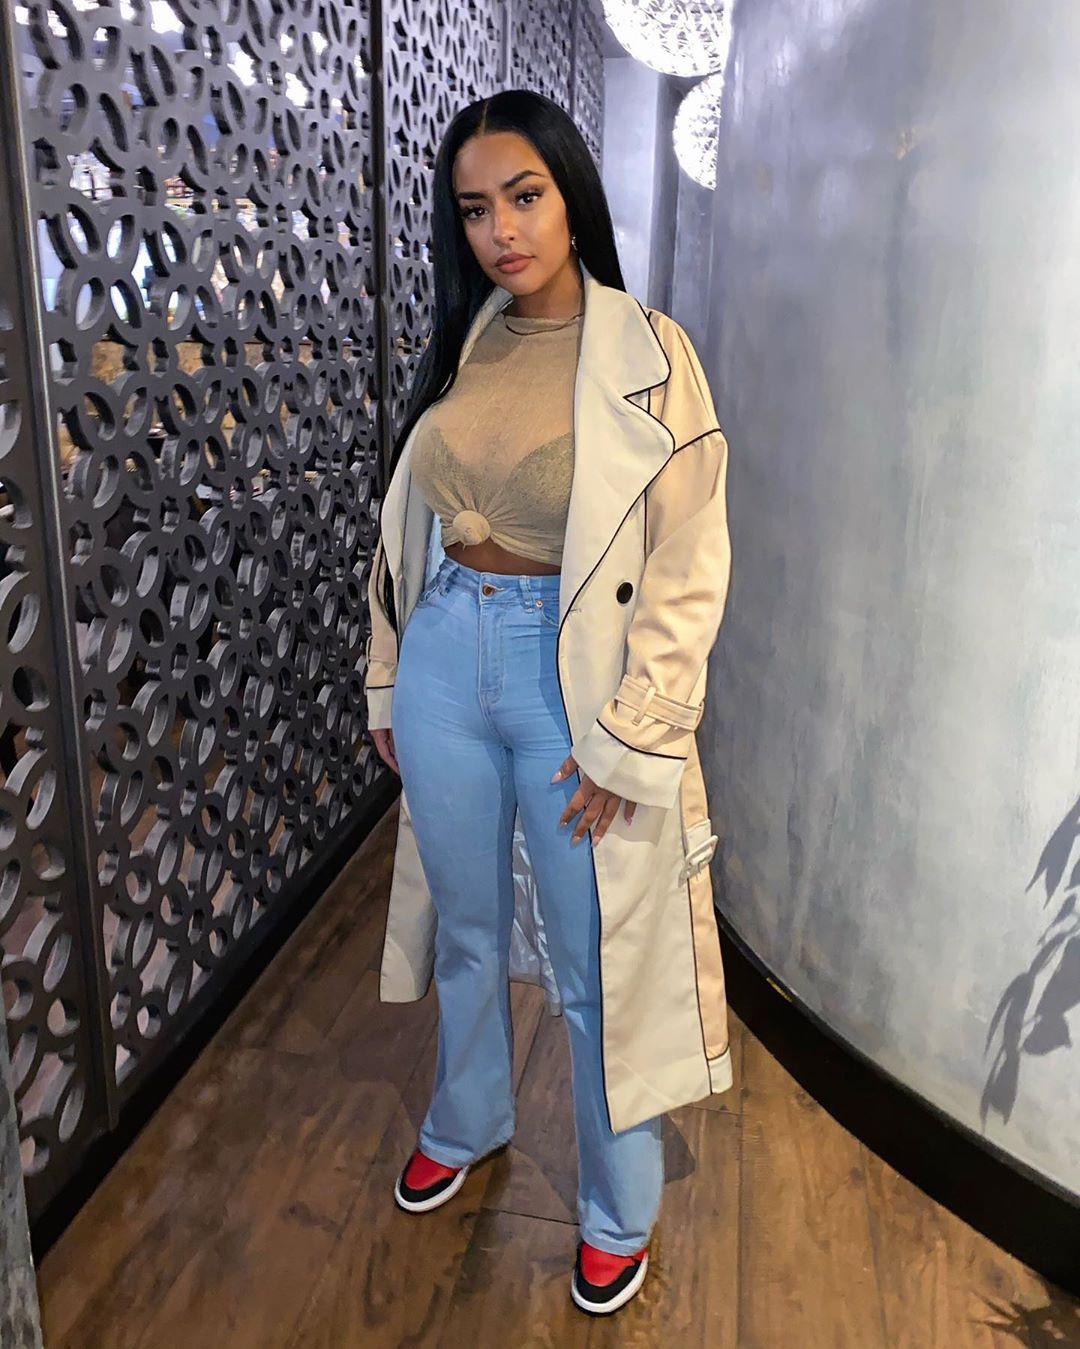 Nabz Instagram trousers, denim, jeans dresses ideas